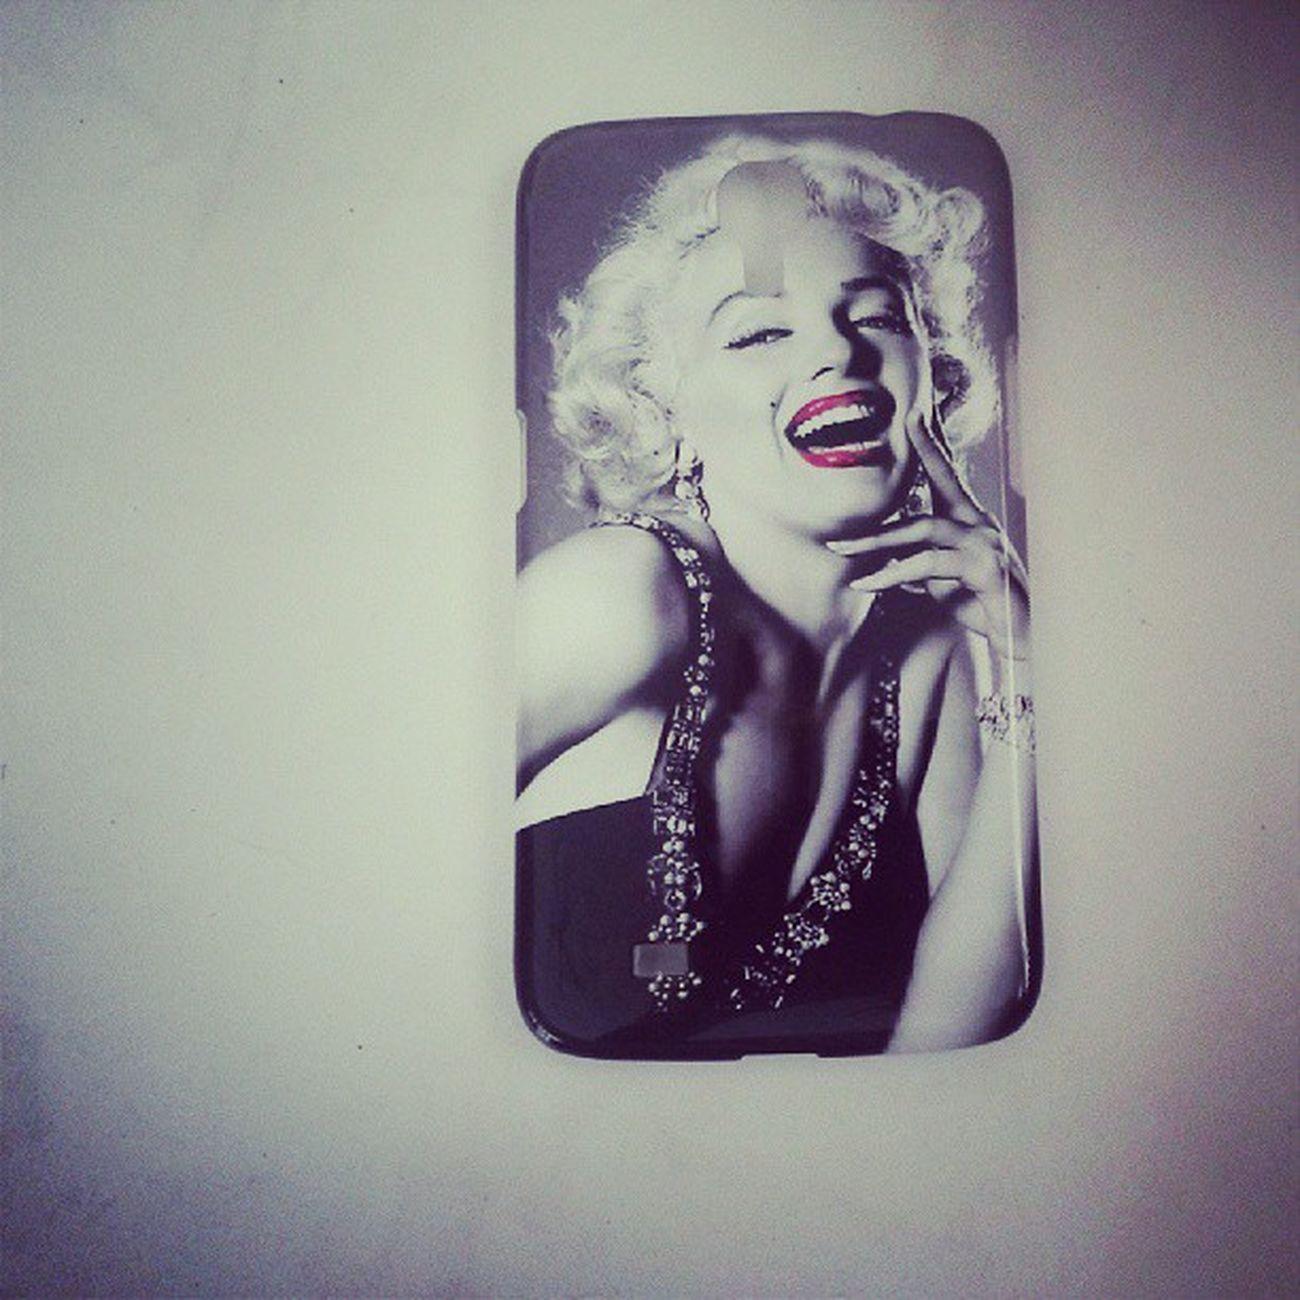 Marilynmonreo huhuhu telefon kabim :D ♡♡♡♡♡♡